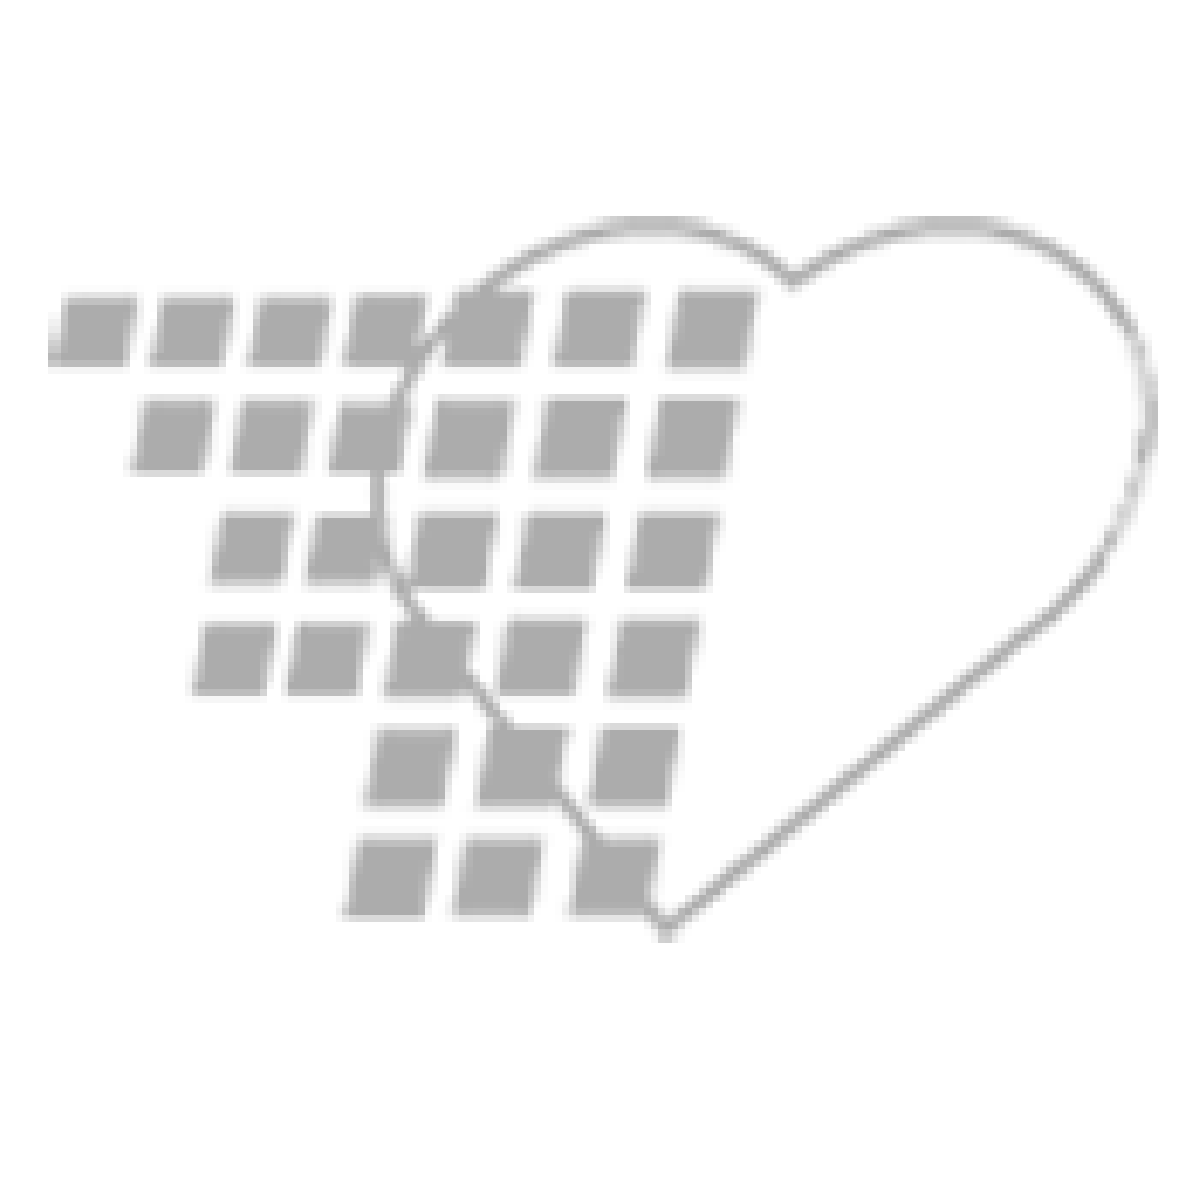 10-81-4190 Fetus Ultrasound Examination Phantom SPACEFAN-ST